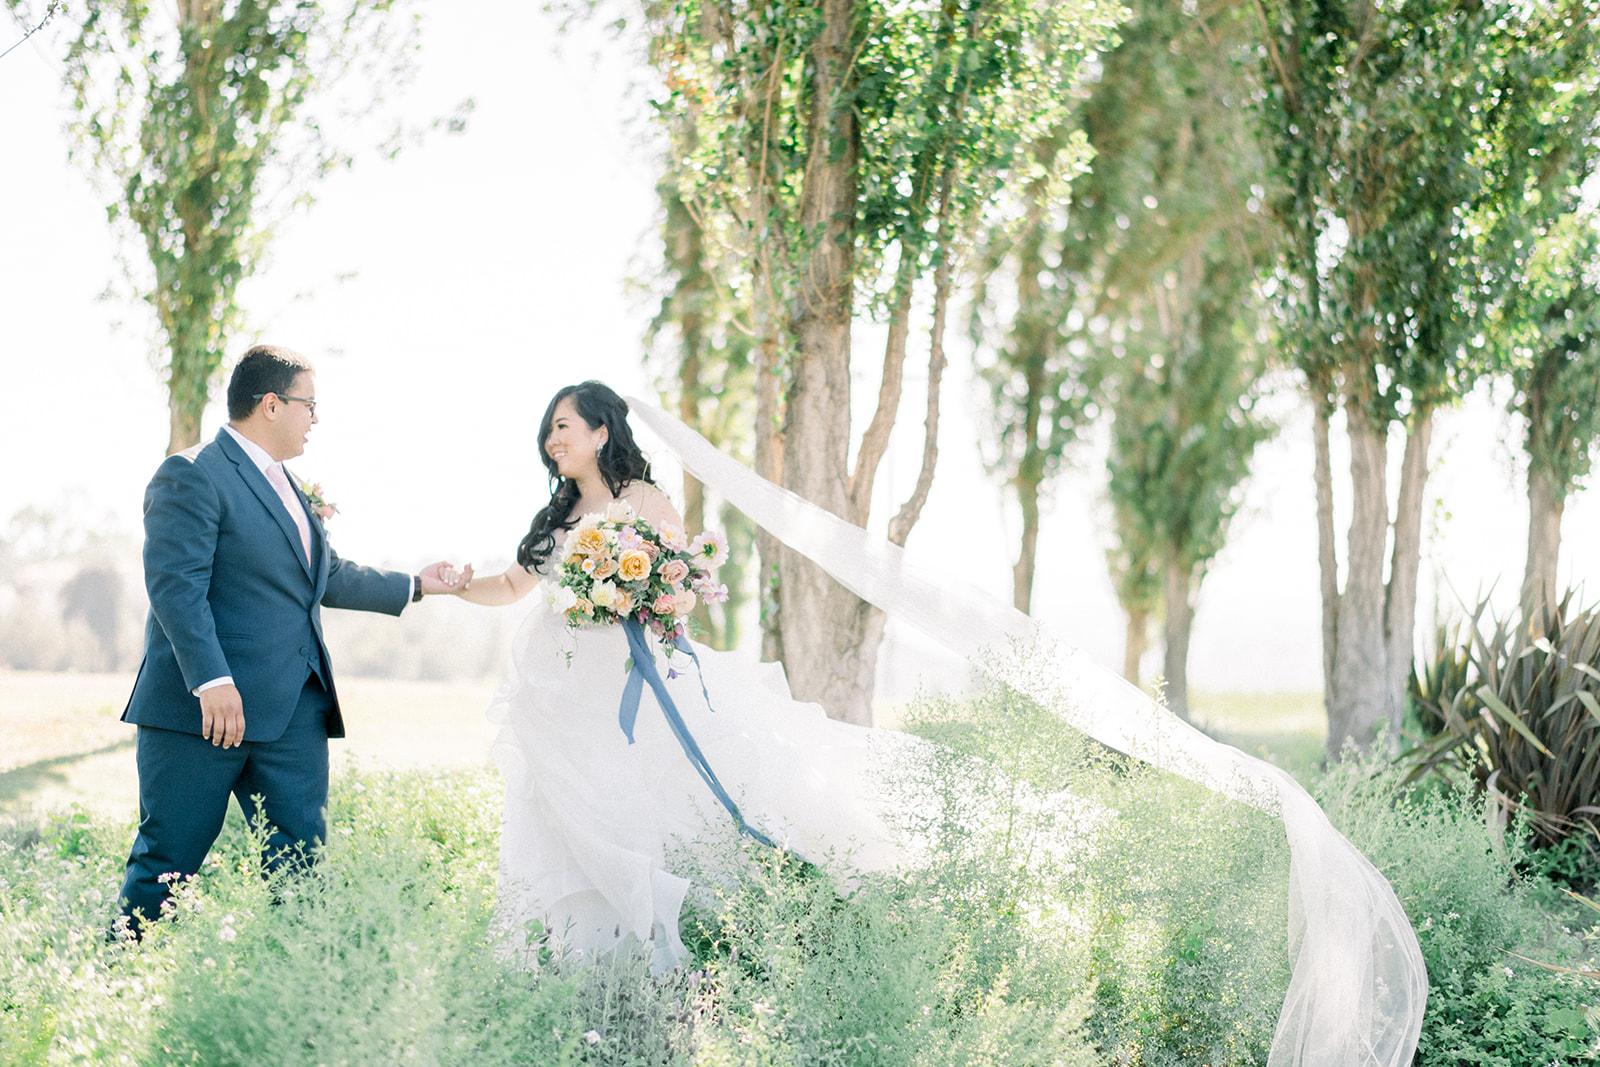 jessicaanderick-wedding-751.jpg